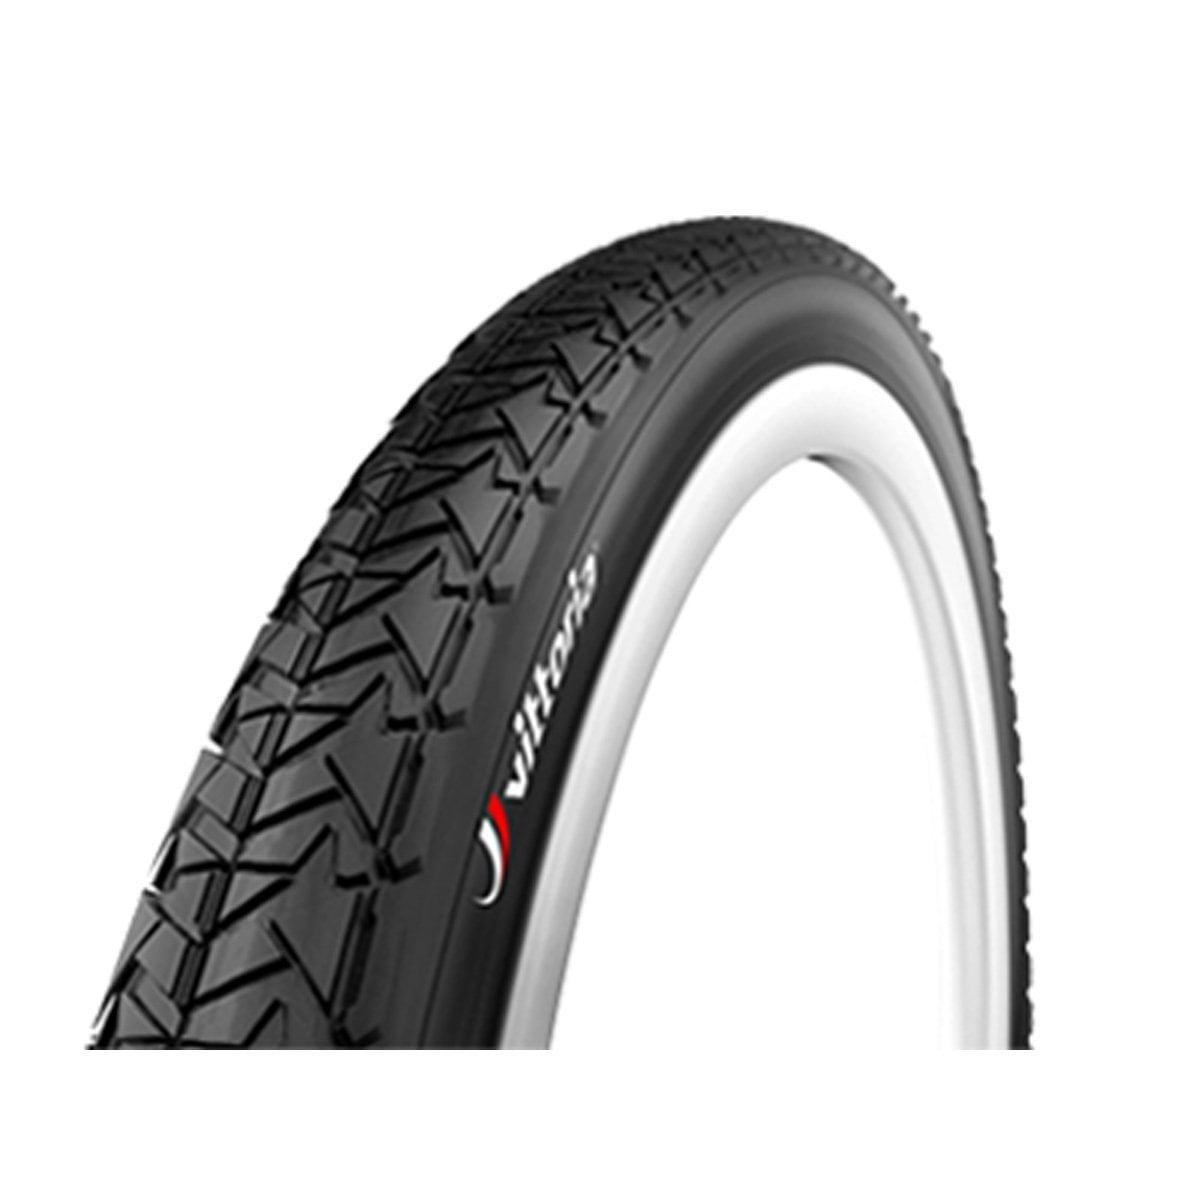 Evolution Tire, Black, 29 x 1.9, Bike specific By Vittoria